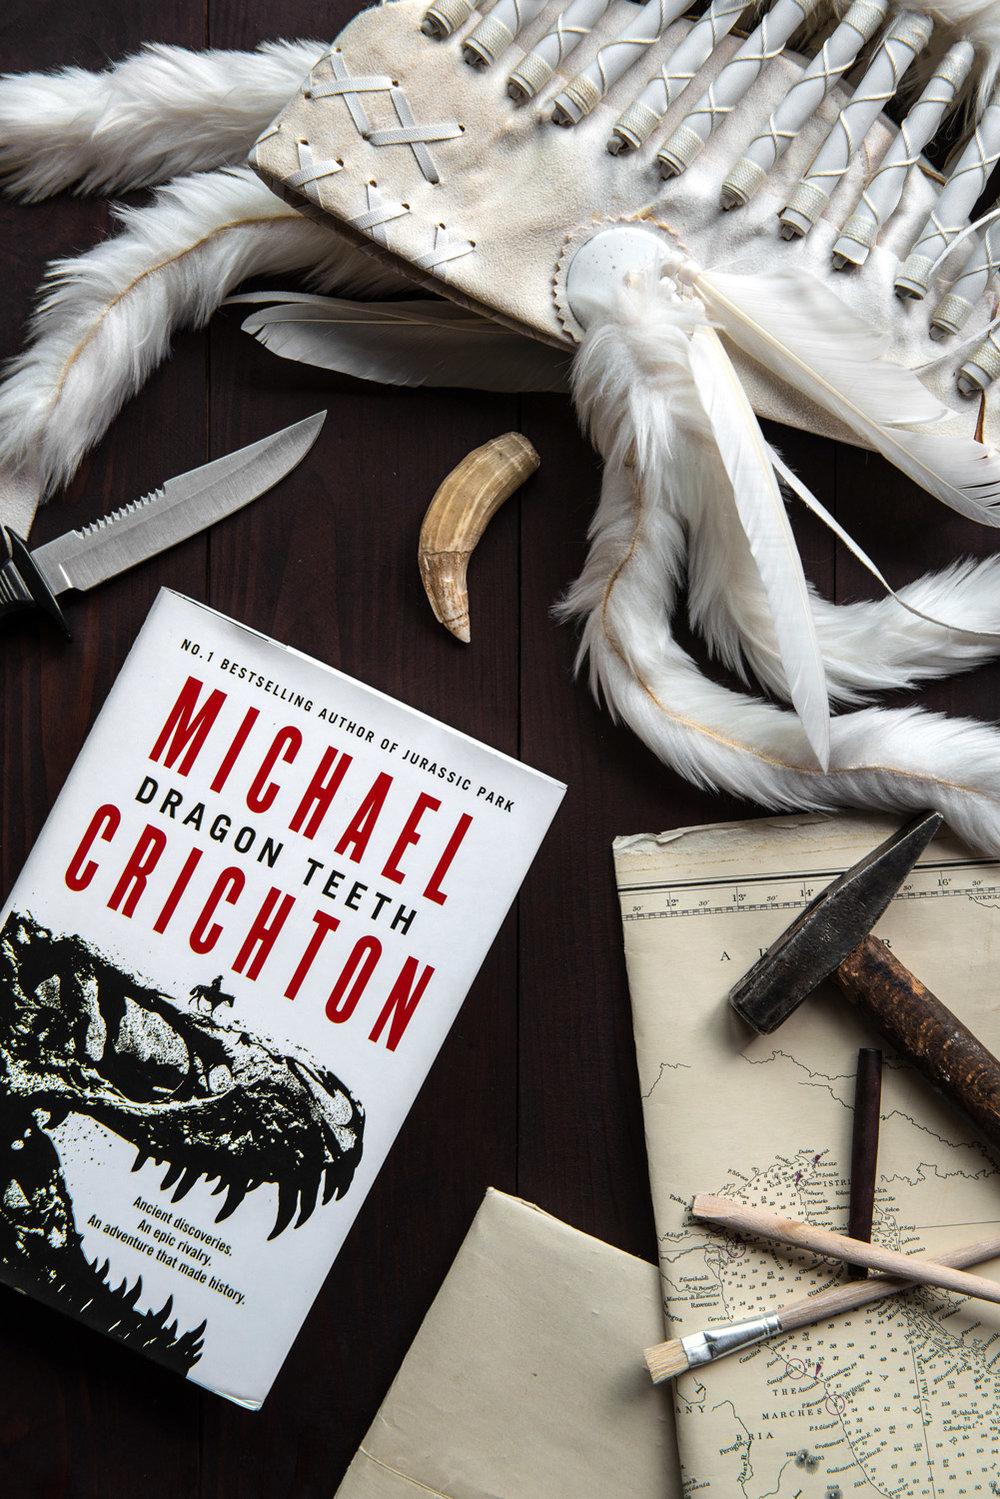 Crichton_dragon_teeth_book_mruksbooks_mruki_ksiazka.jpg